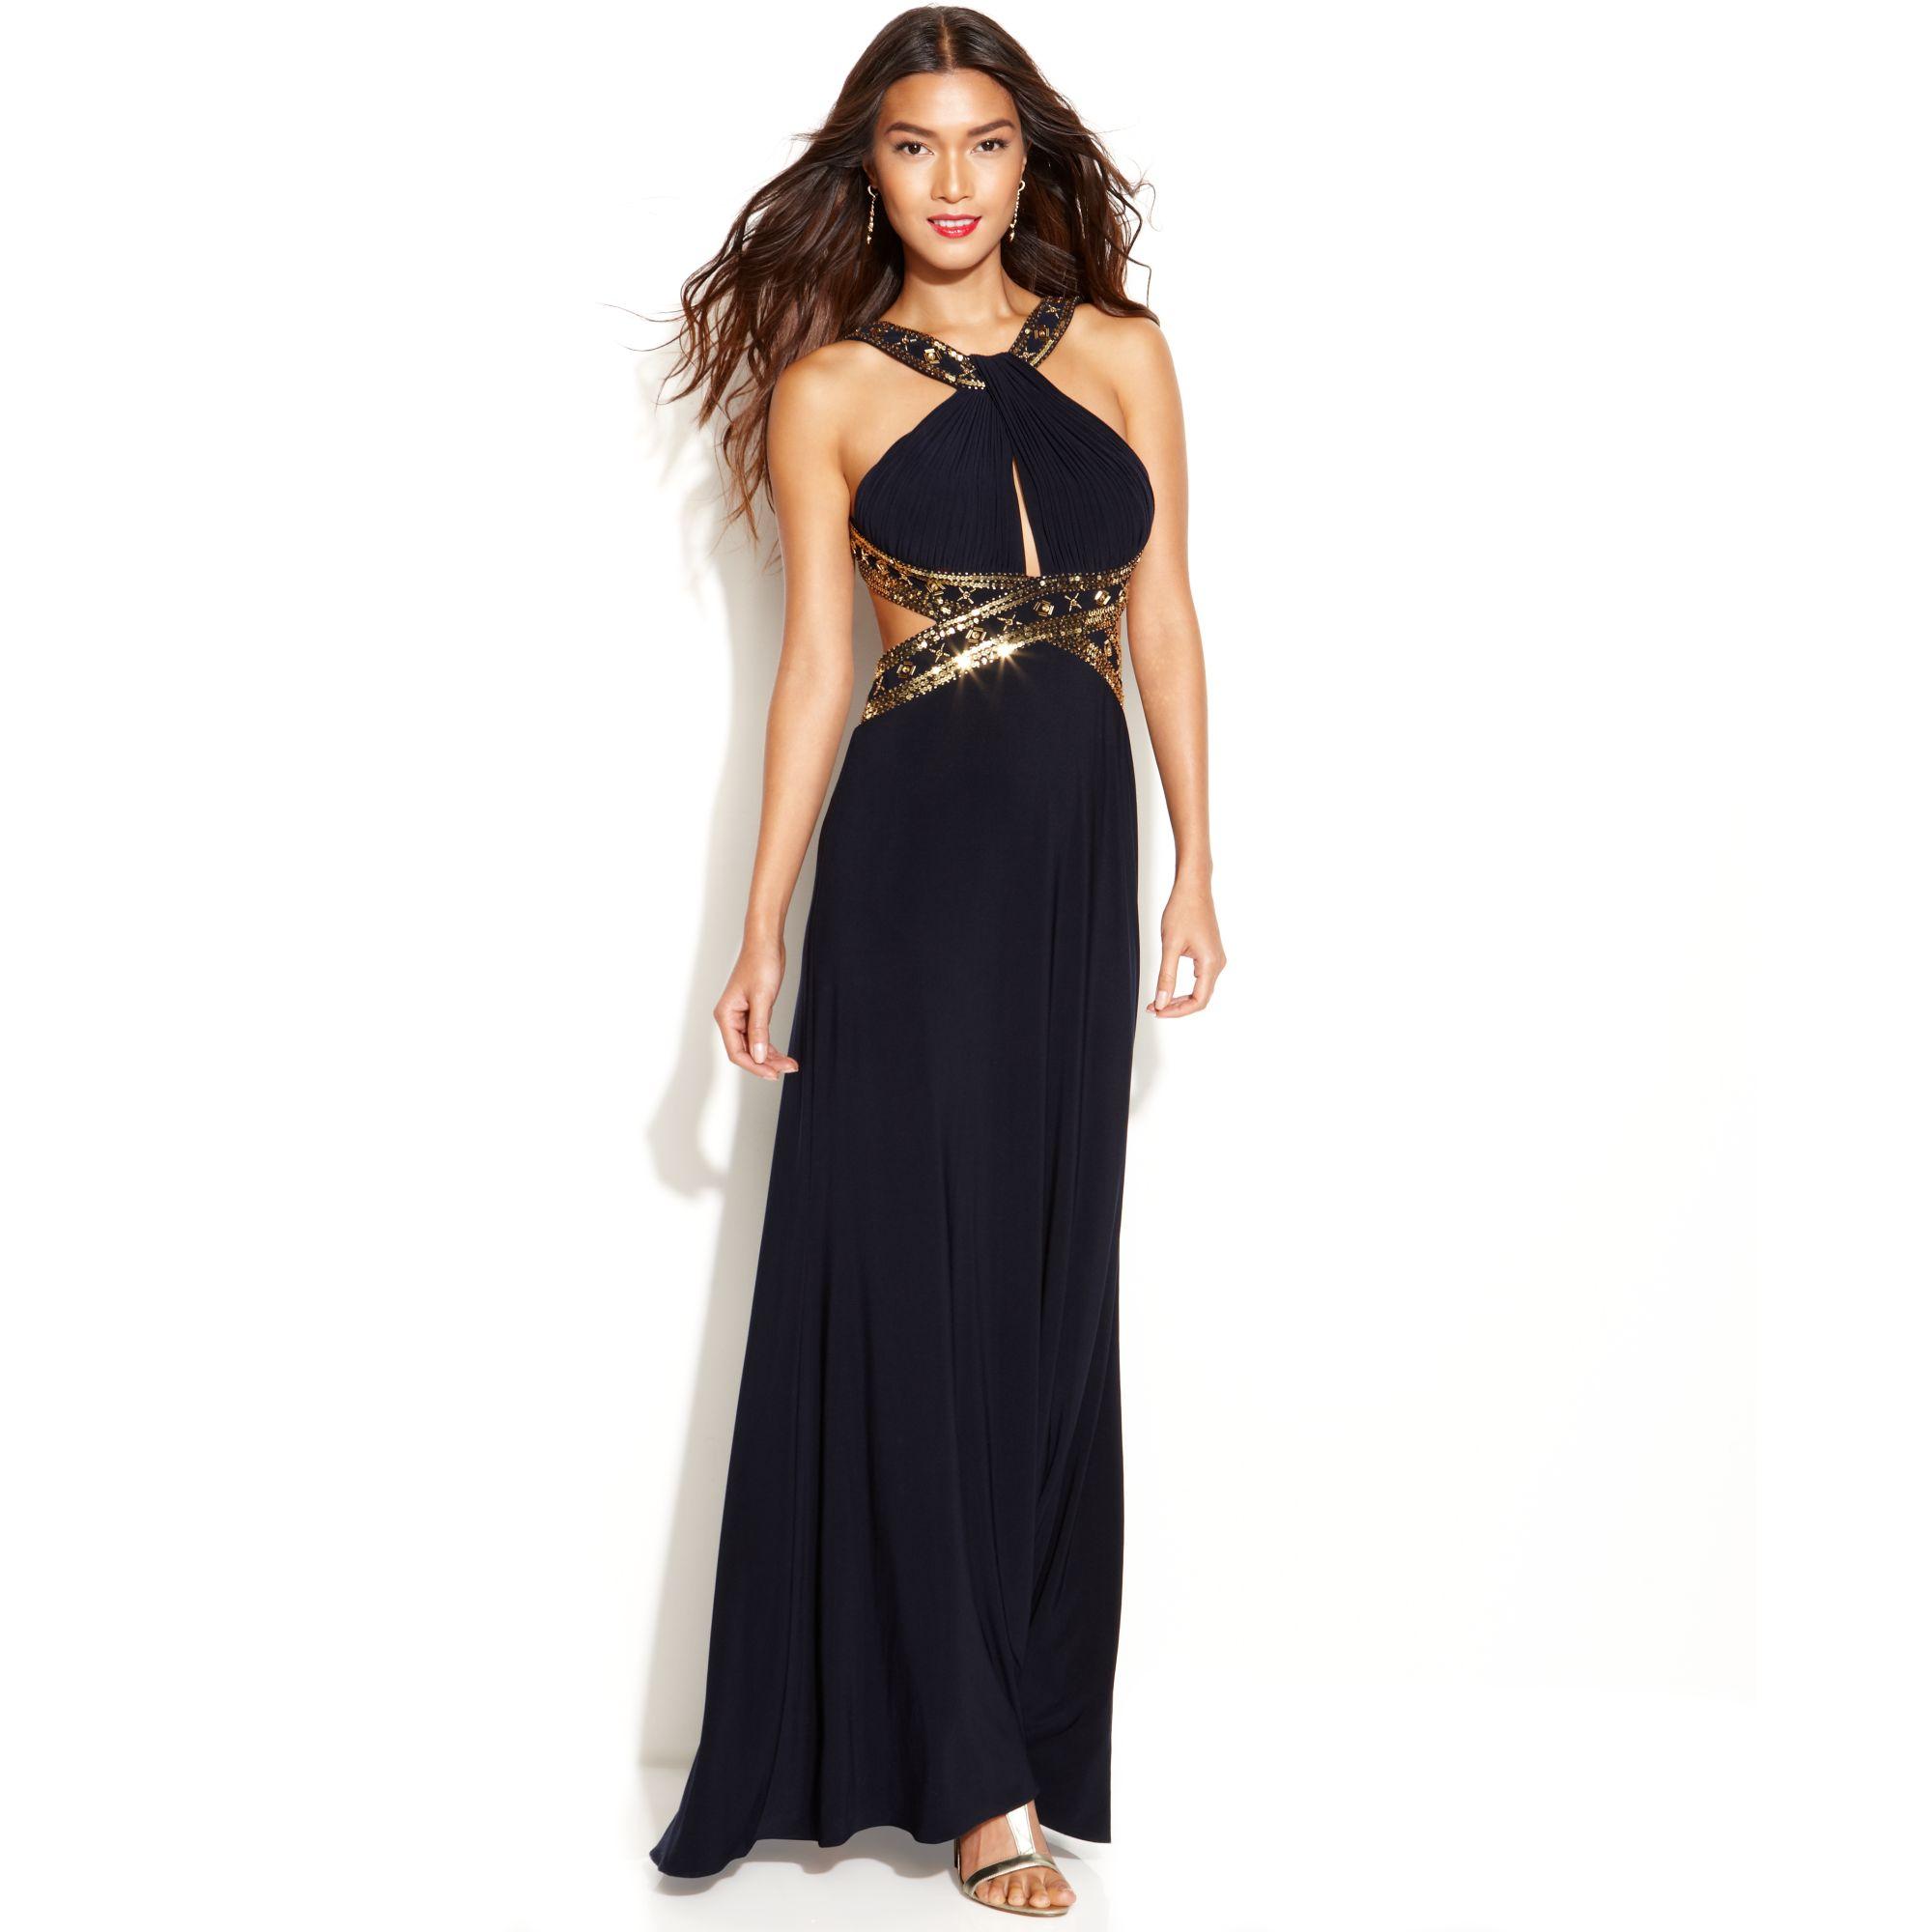 0dde15c7251a Betsy Adam Prom Dresses - Photo Dress Wallpaper HD AOrg